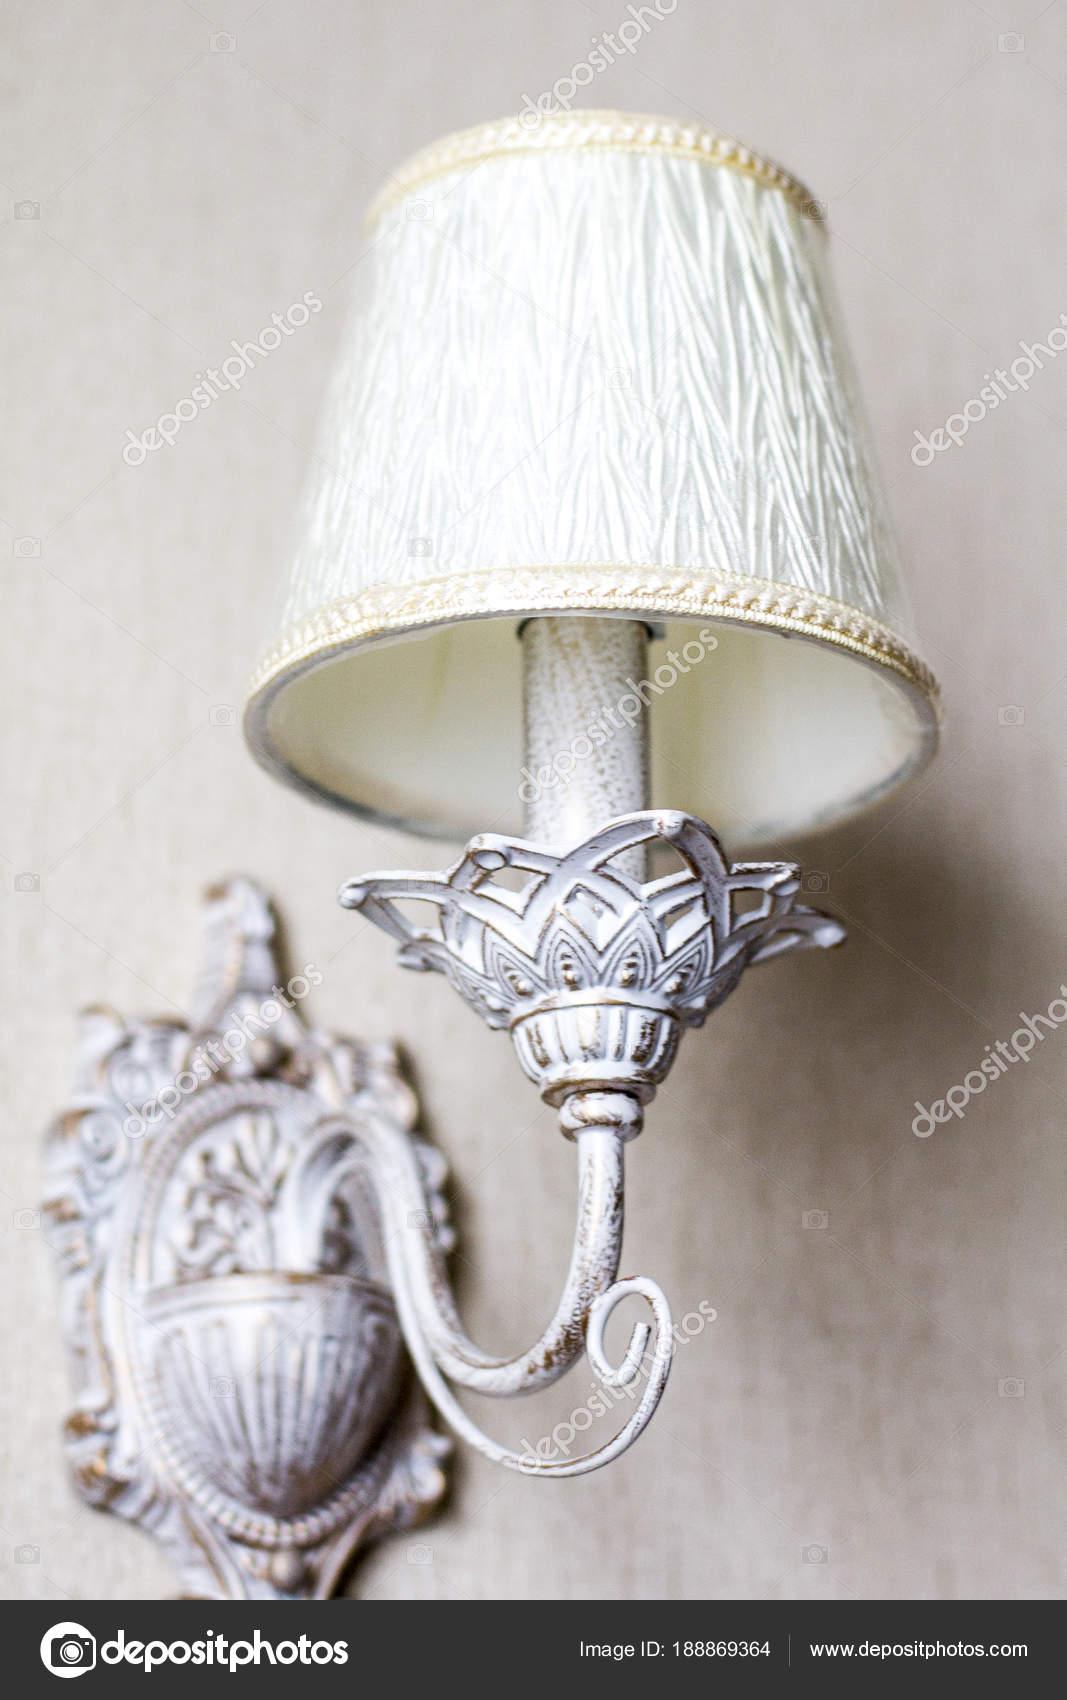 depositphotos_188869364-stock-photo-vintage-chandelier-antique-lamp-interior.jpg